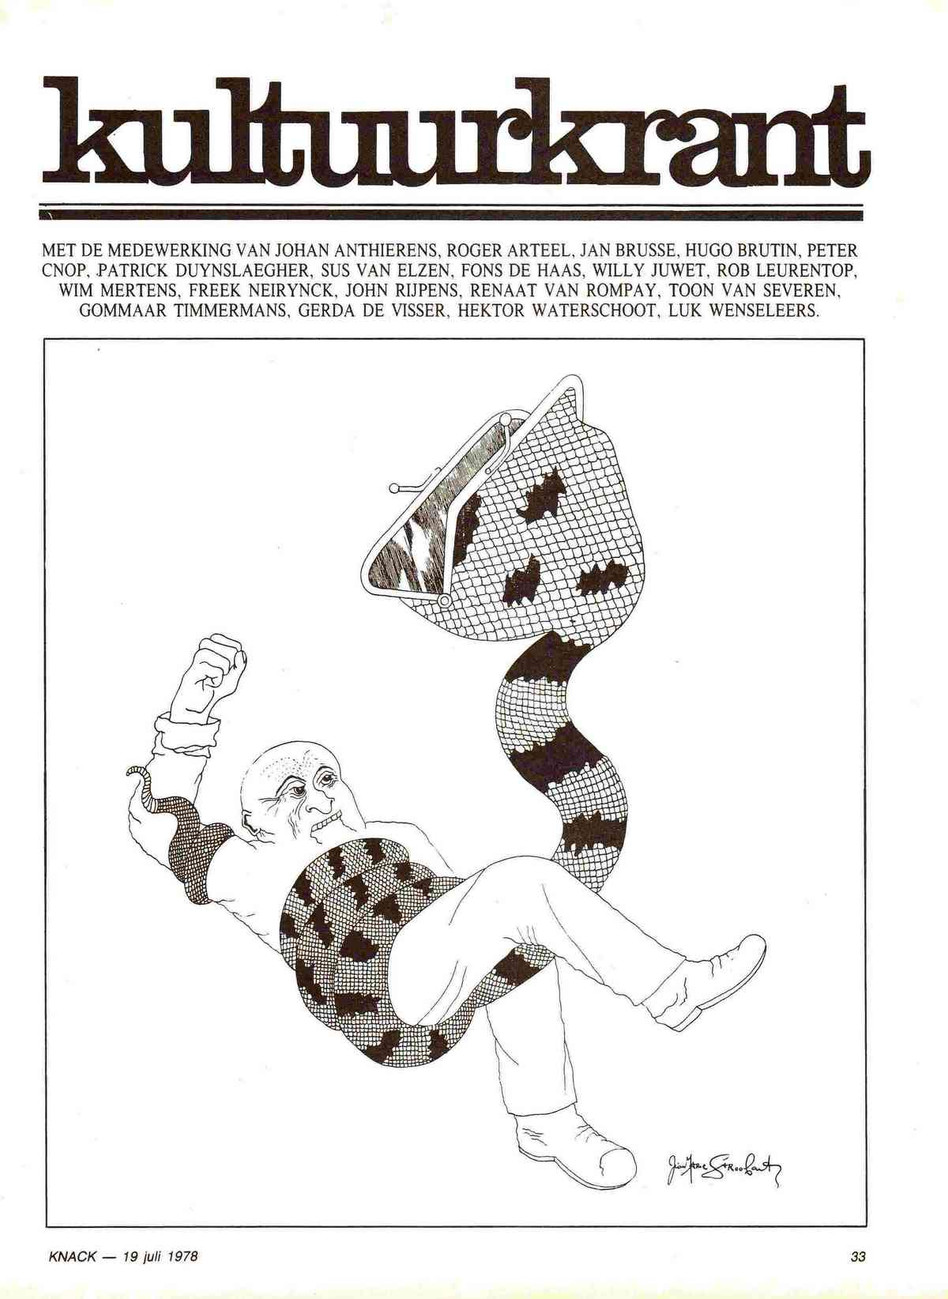 KNACK Magazine - 1978